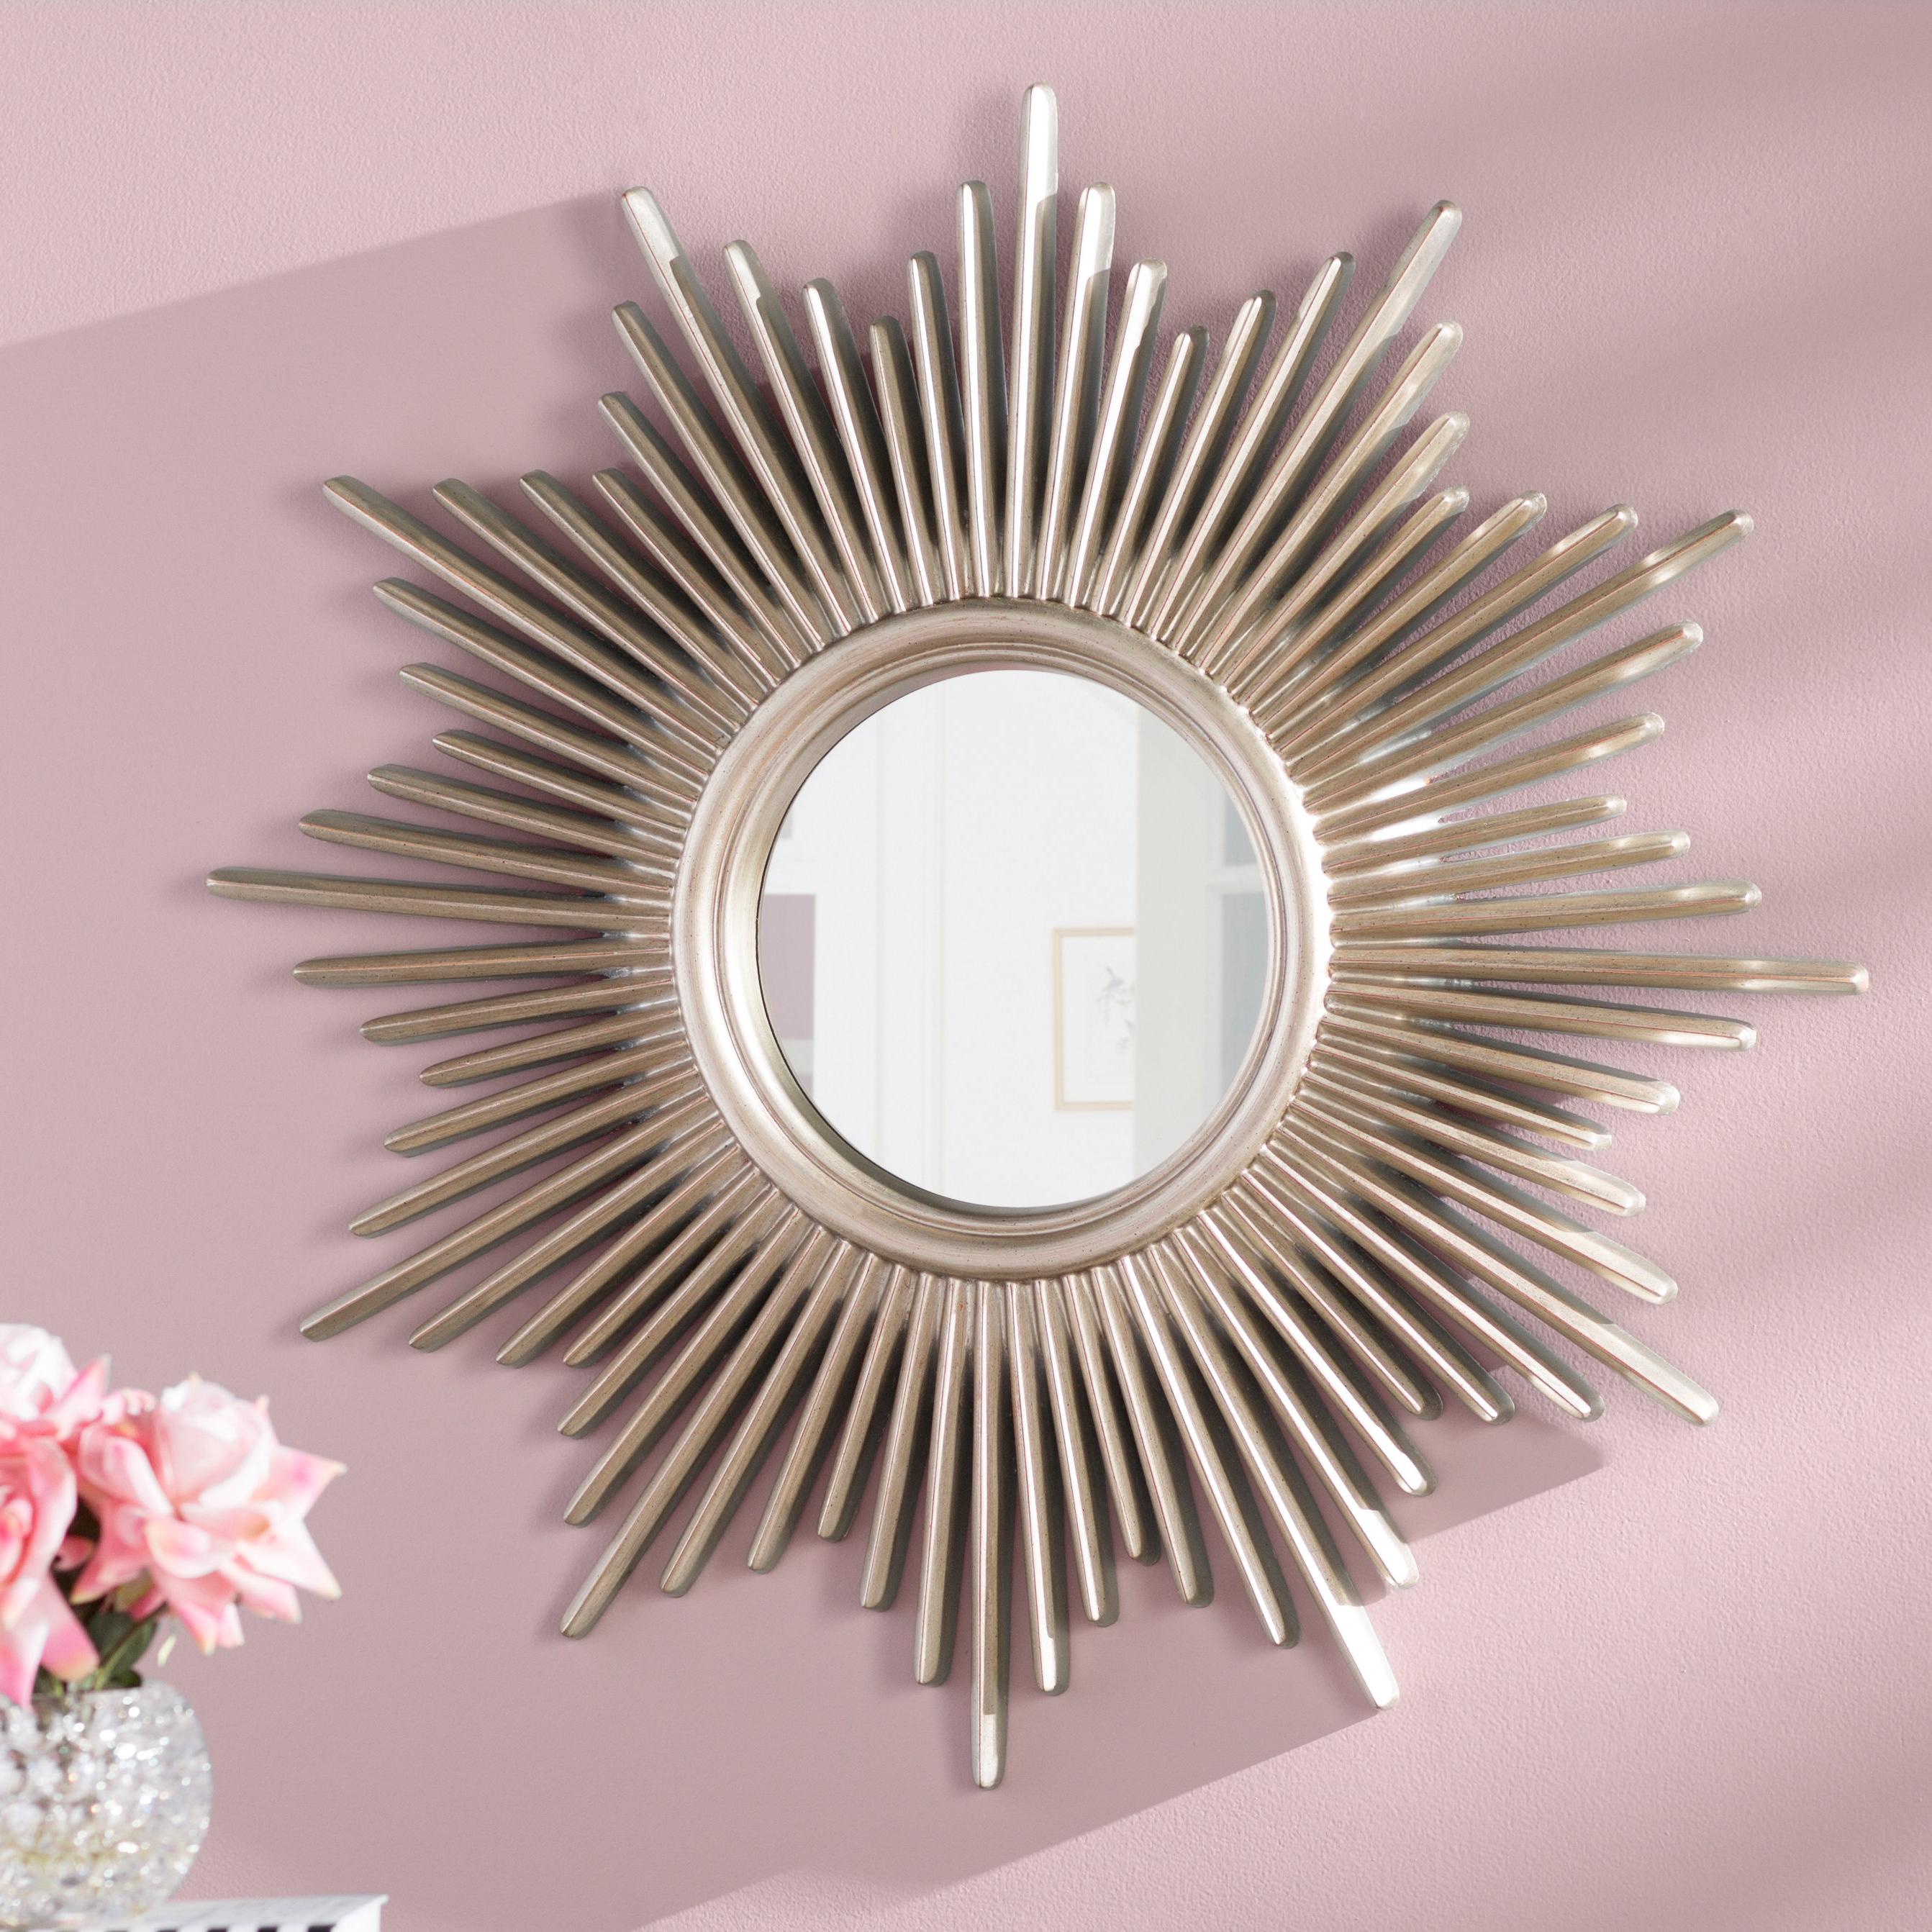 Best And Newest Josephson Starburst Glam Beveled Accent Wall Mirror Within Josephson Starburst Glam Beveled Accent Wall Mirrors (View 2 of 20)